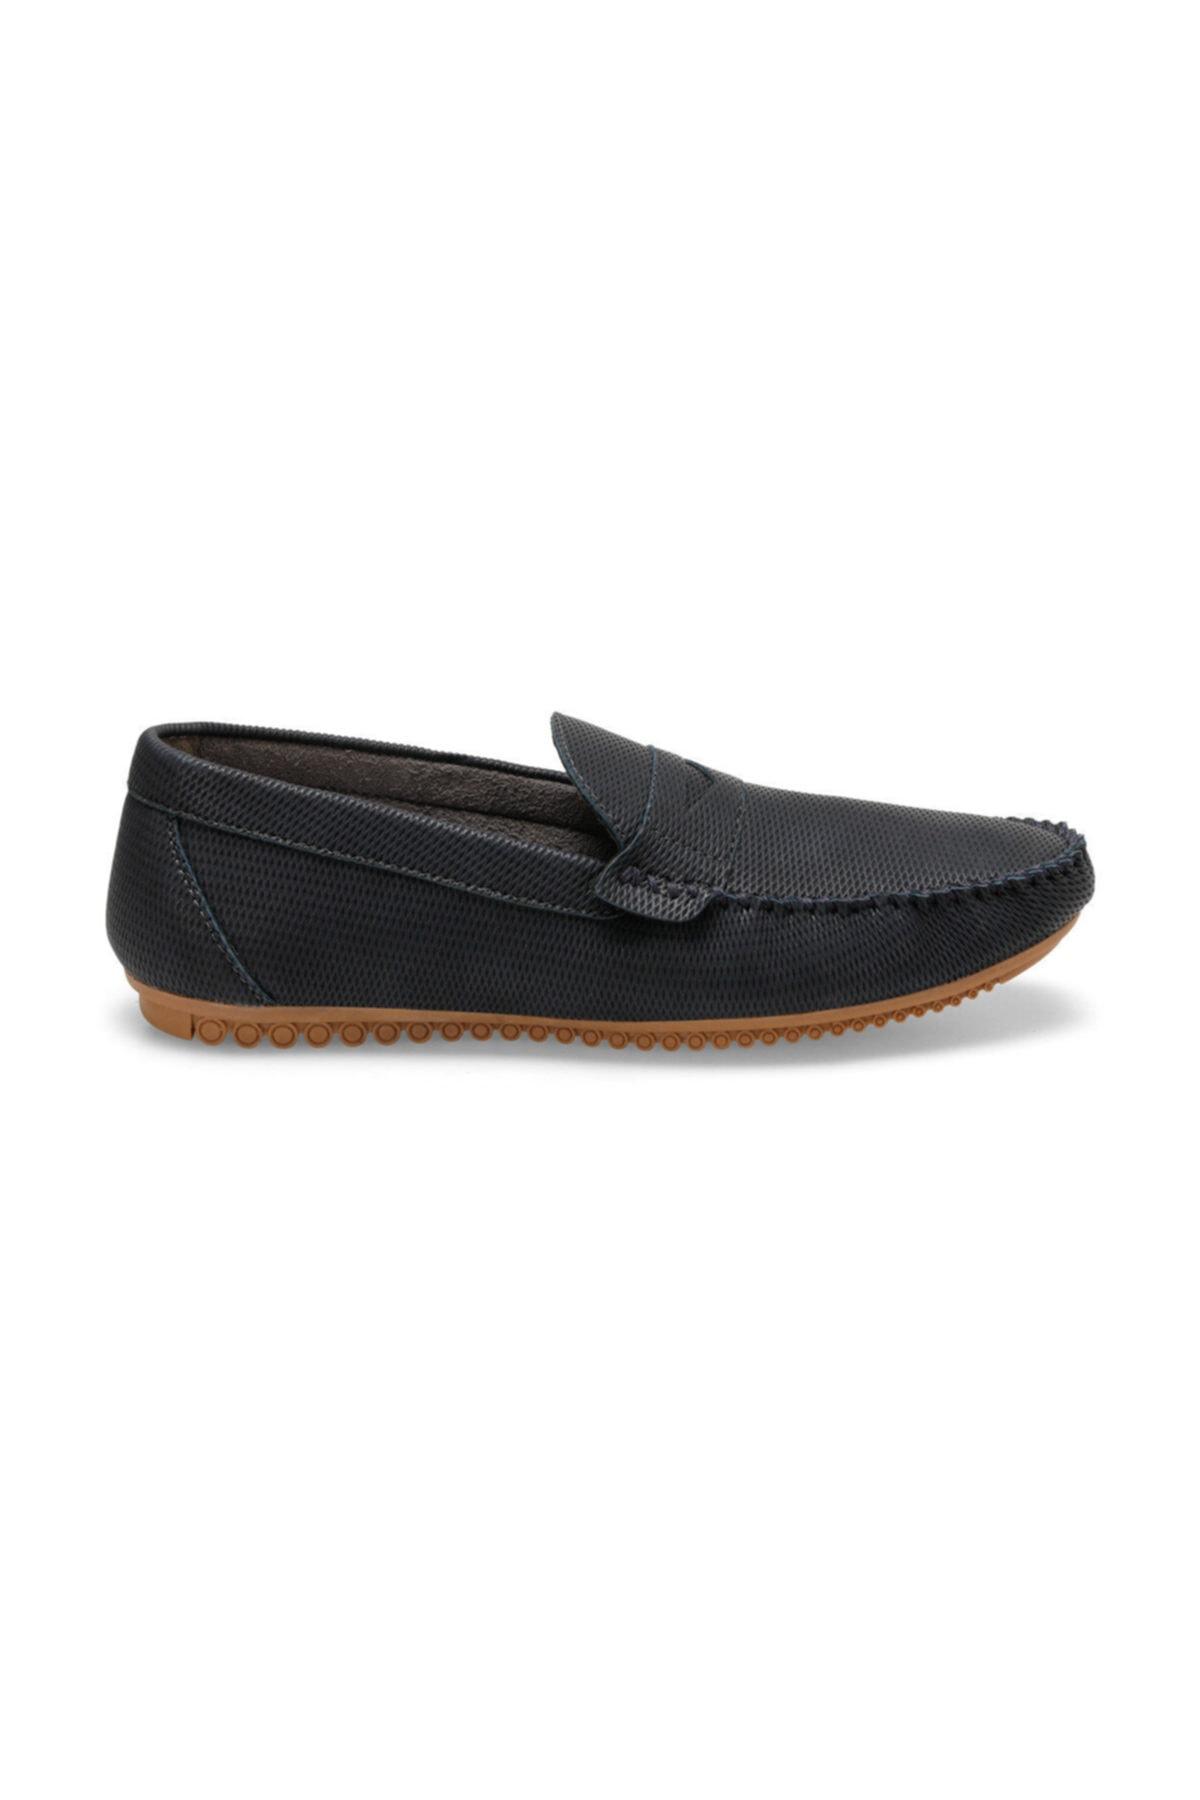 OXIDE MDL2 C Lacivert Erkek Loafer Ayakkabı 100349388 1